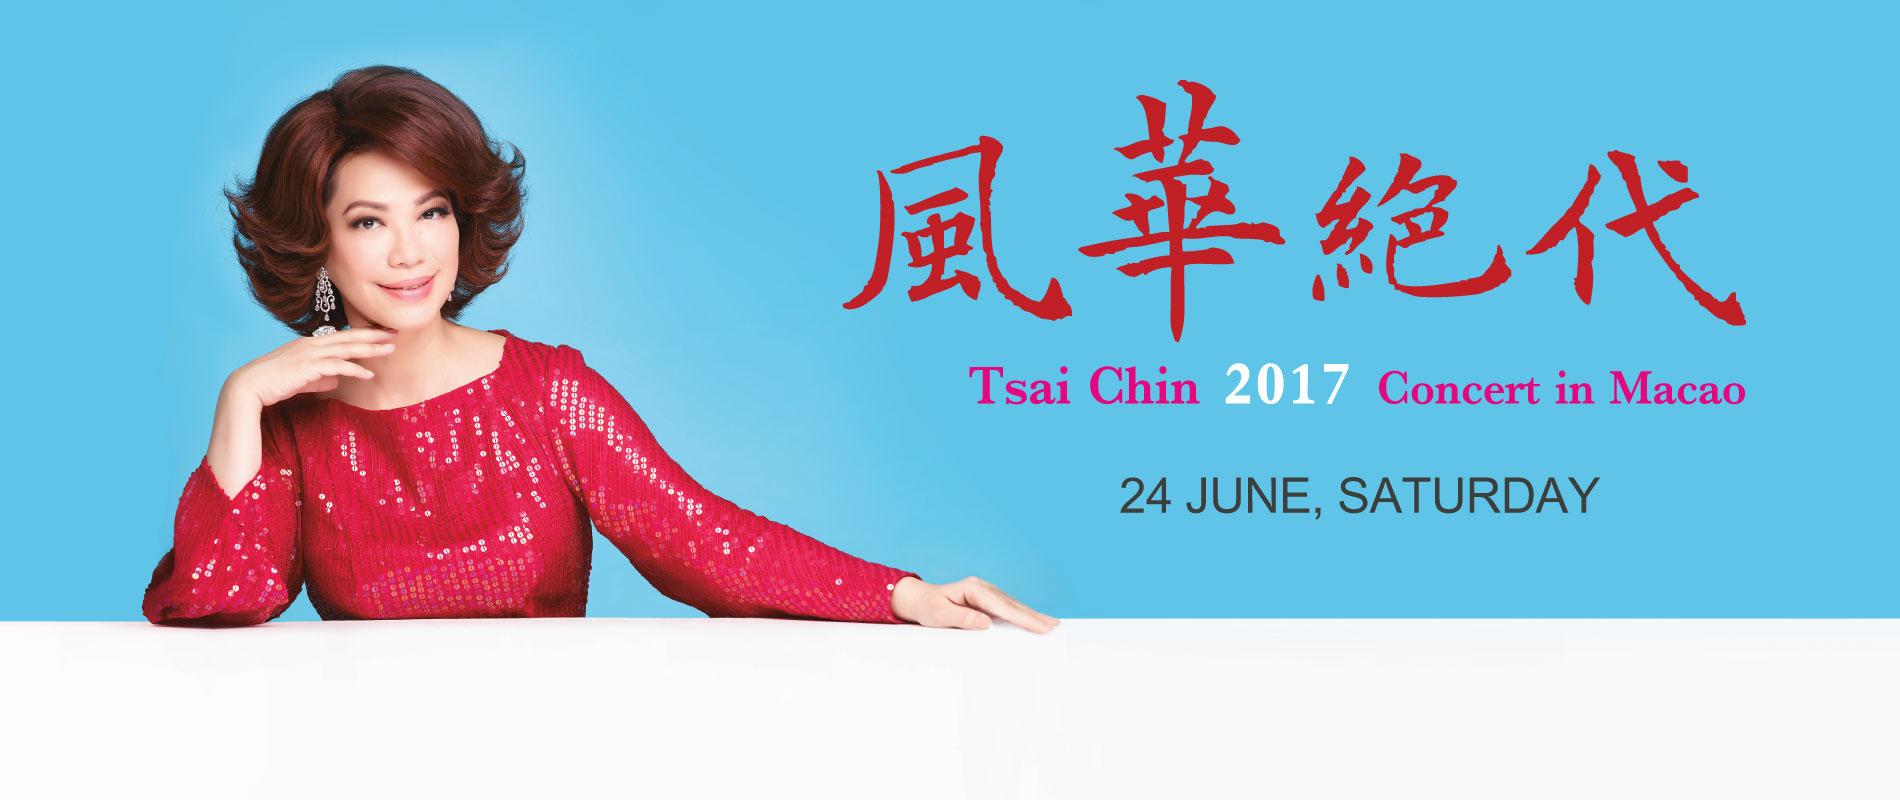 Tsai Chin 2017 Concert in Macao